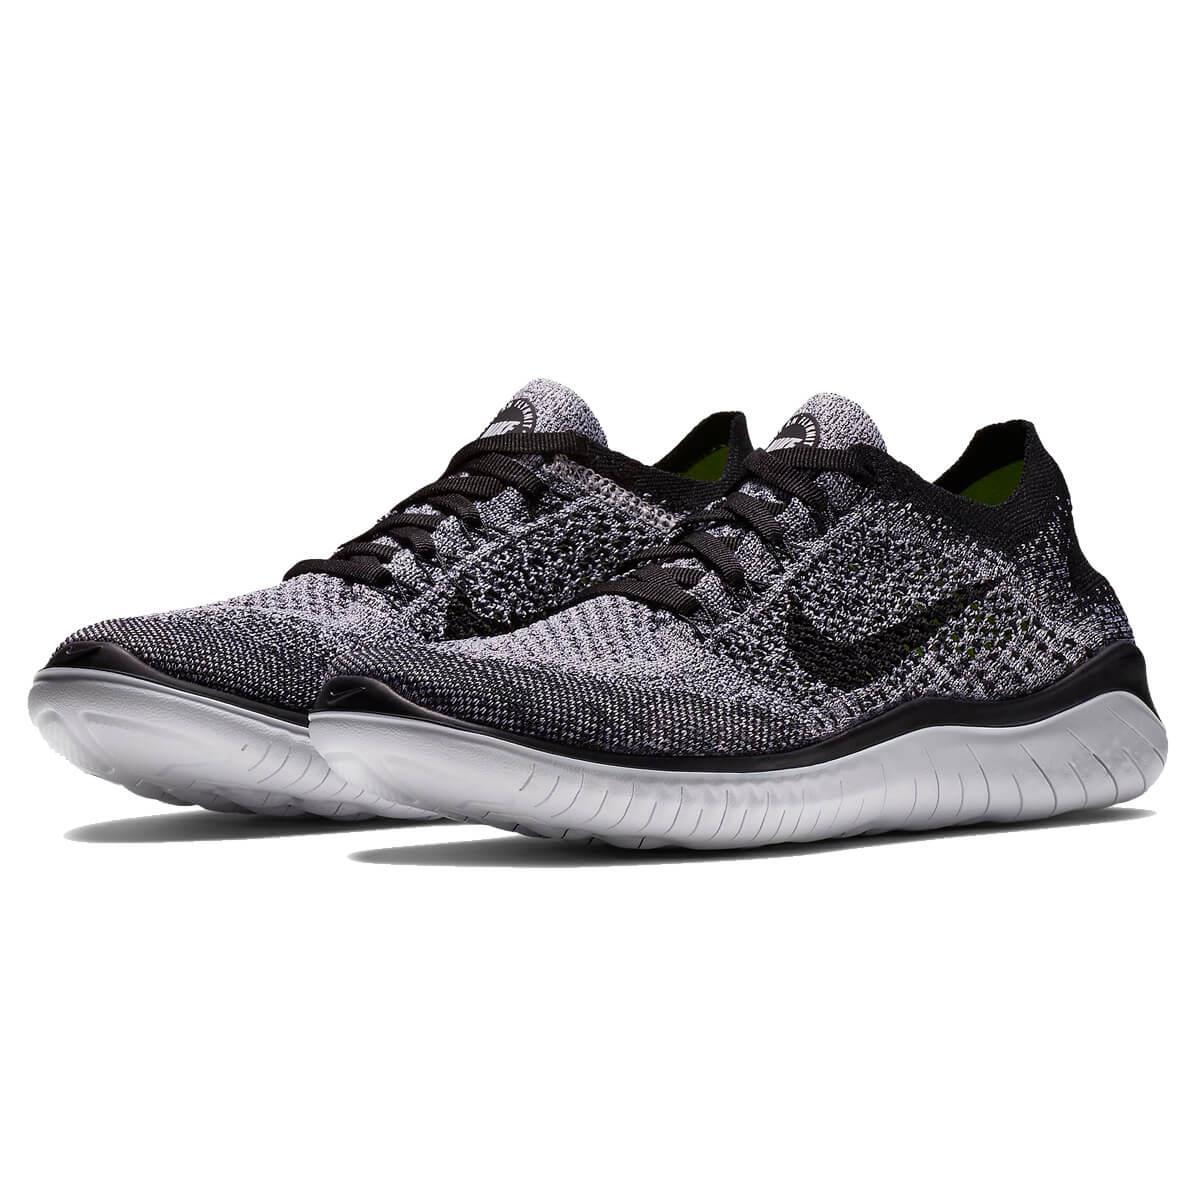 7f01a0095bb Tênis Nike Free RN Flyknit 2018 Feminino